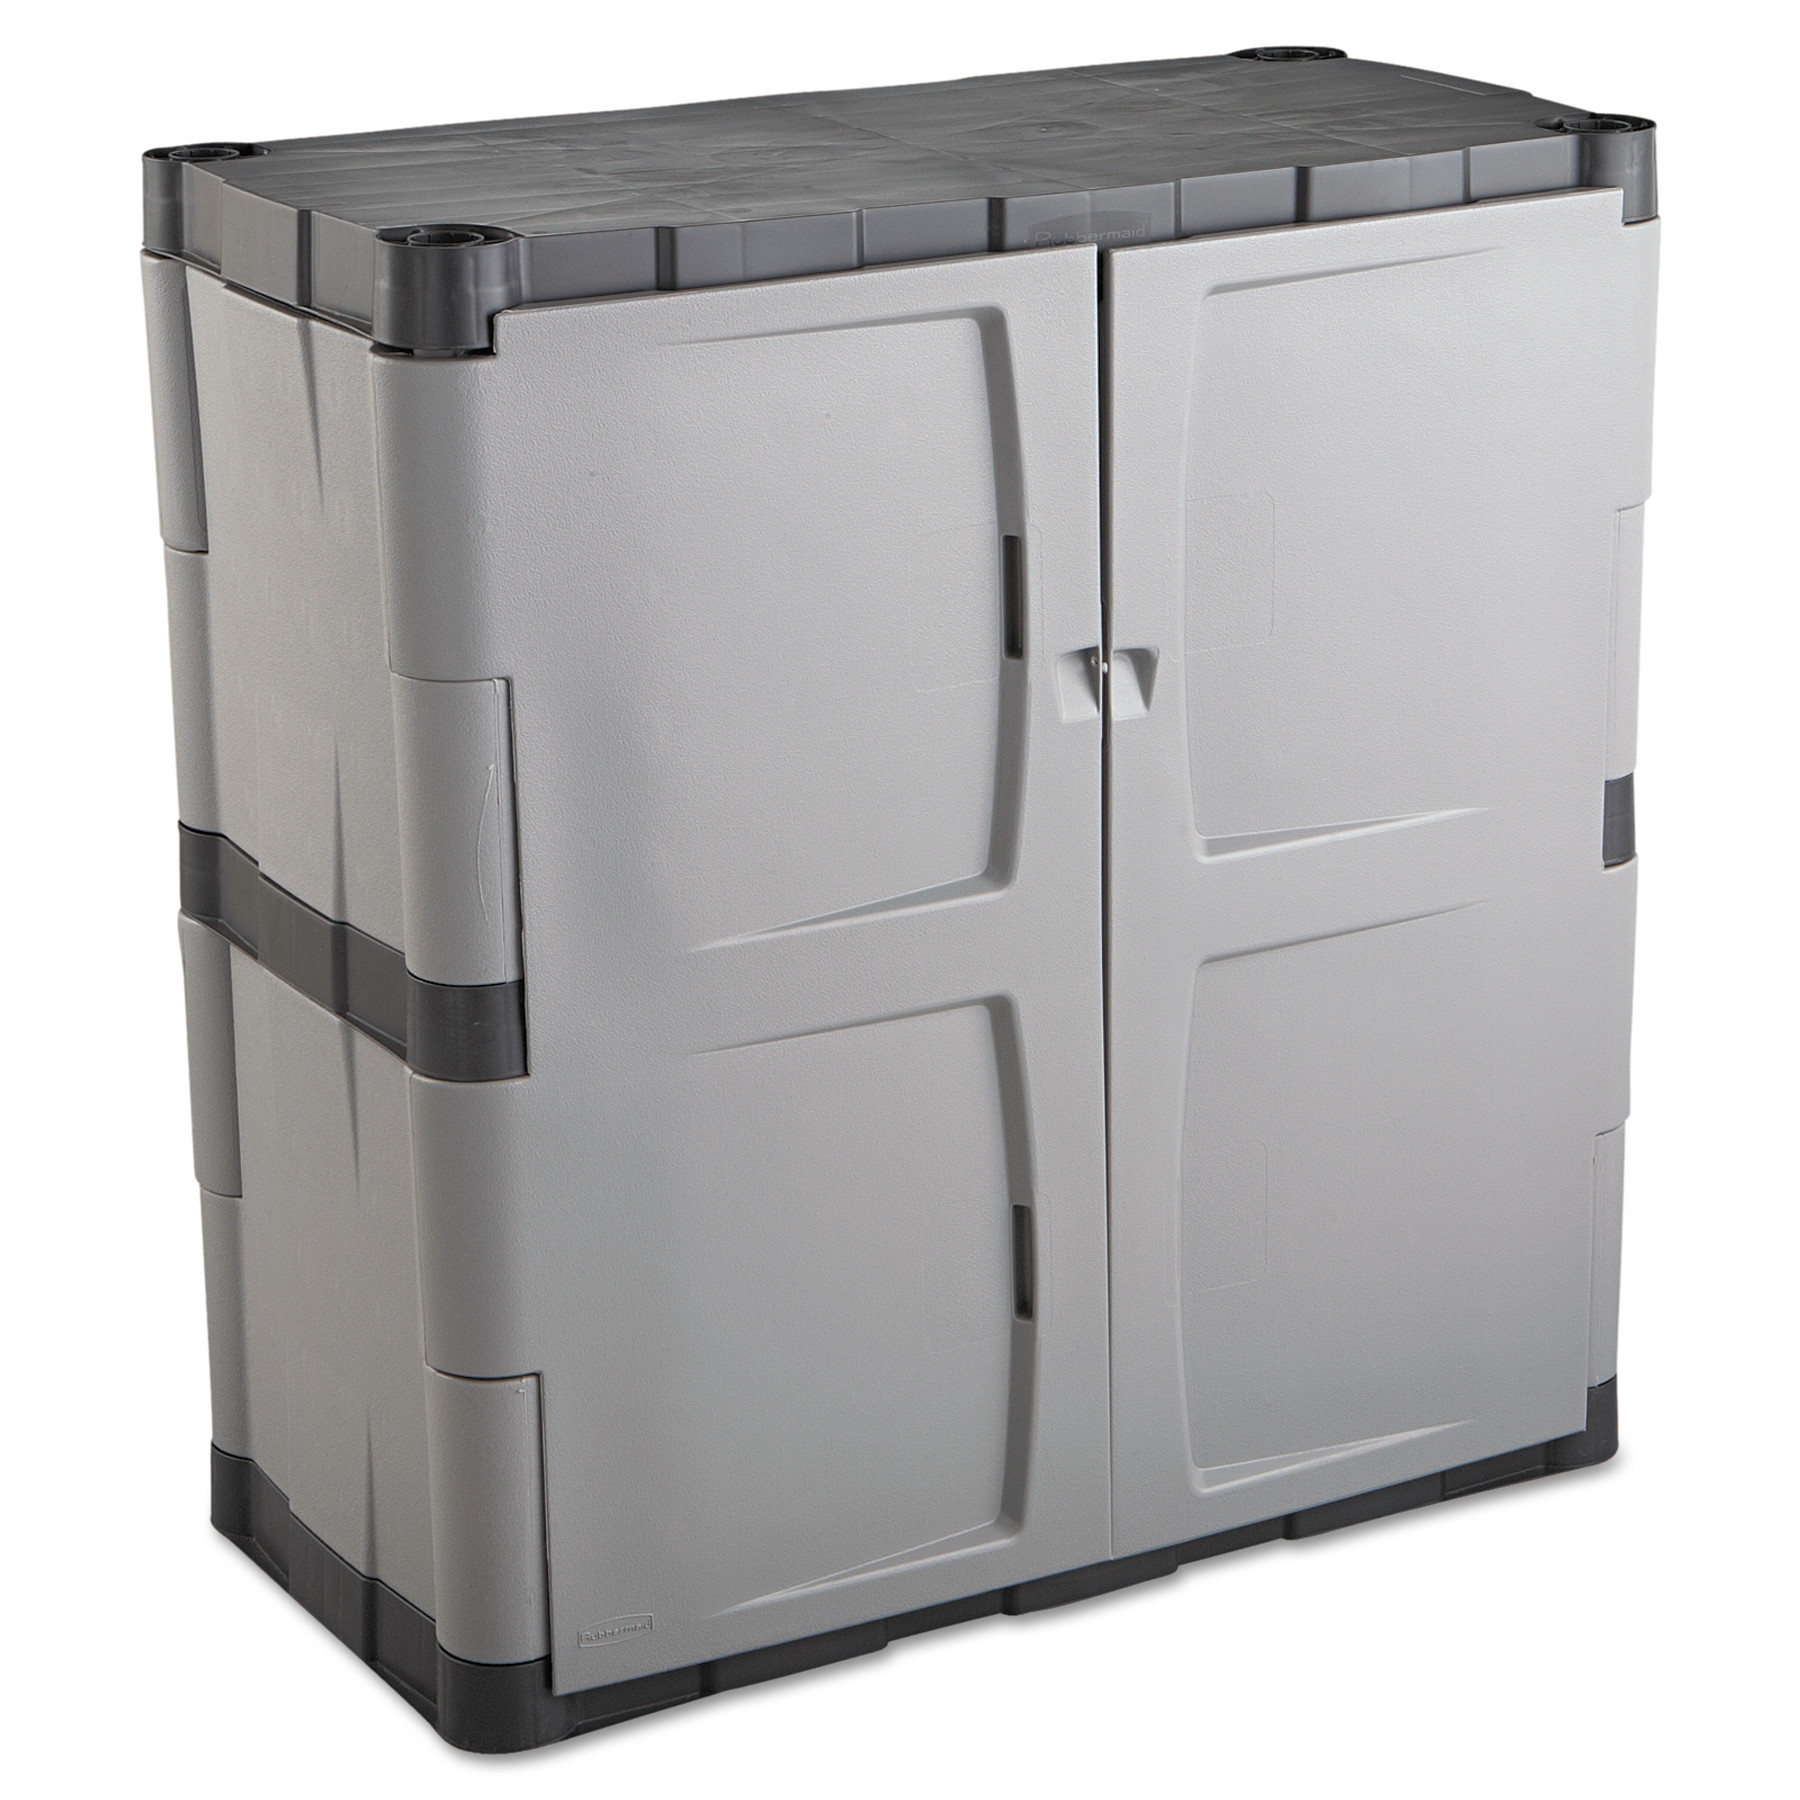 black storage cabinet. Rubbermaid Double-Door Storage Cabinet - Base, 36w X 18d 36h, Gray Black